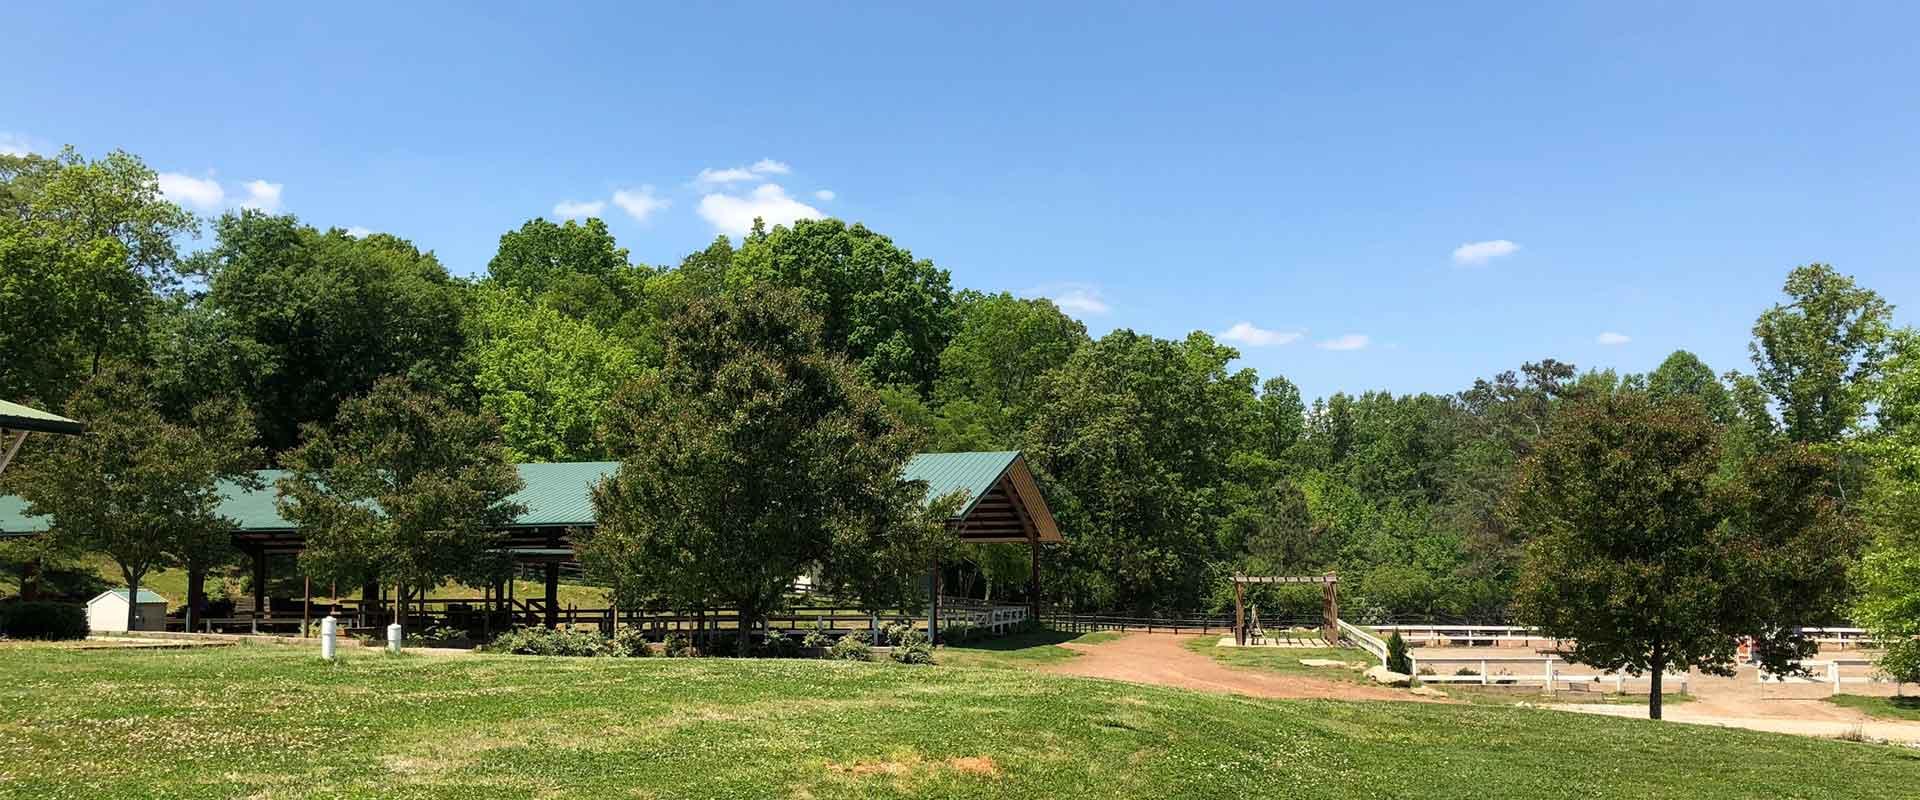 facility-outdoors-foxcroft-farm